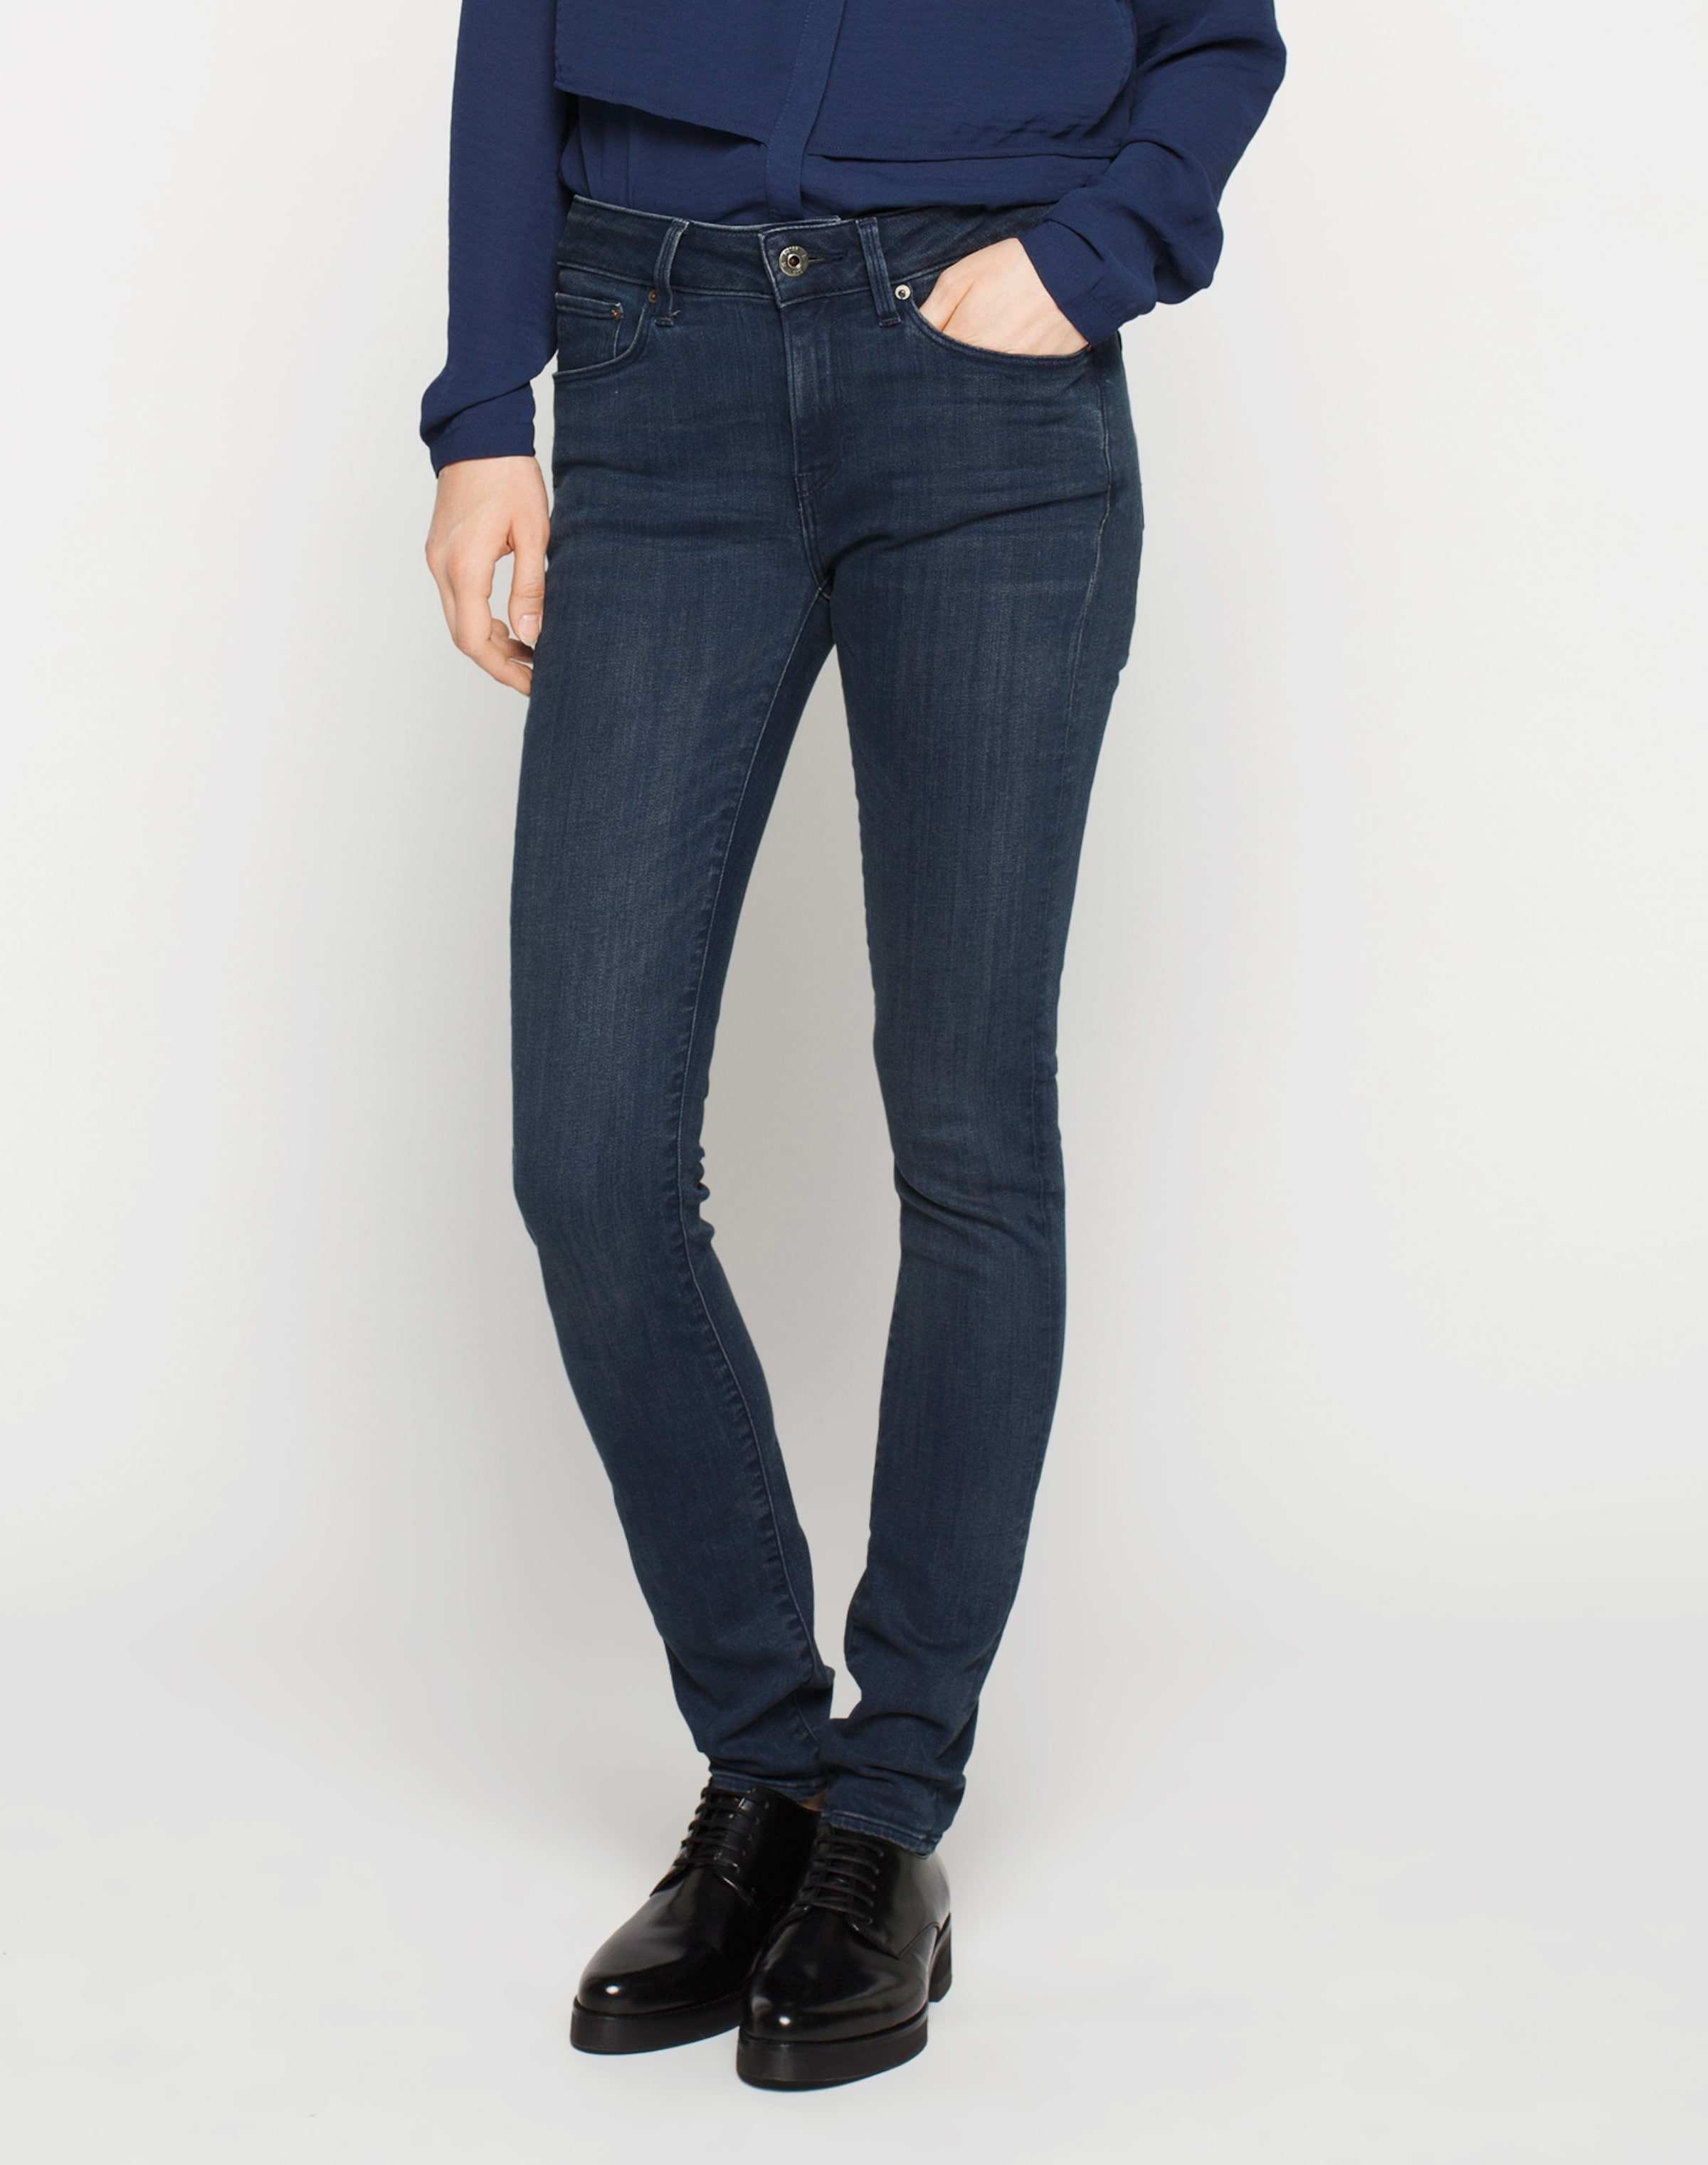 star Raw Jeans G Dunkelblau '3301' In WxodBrCe